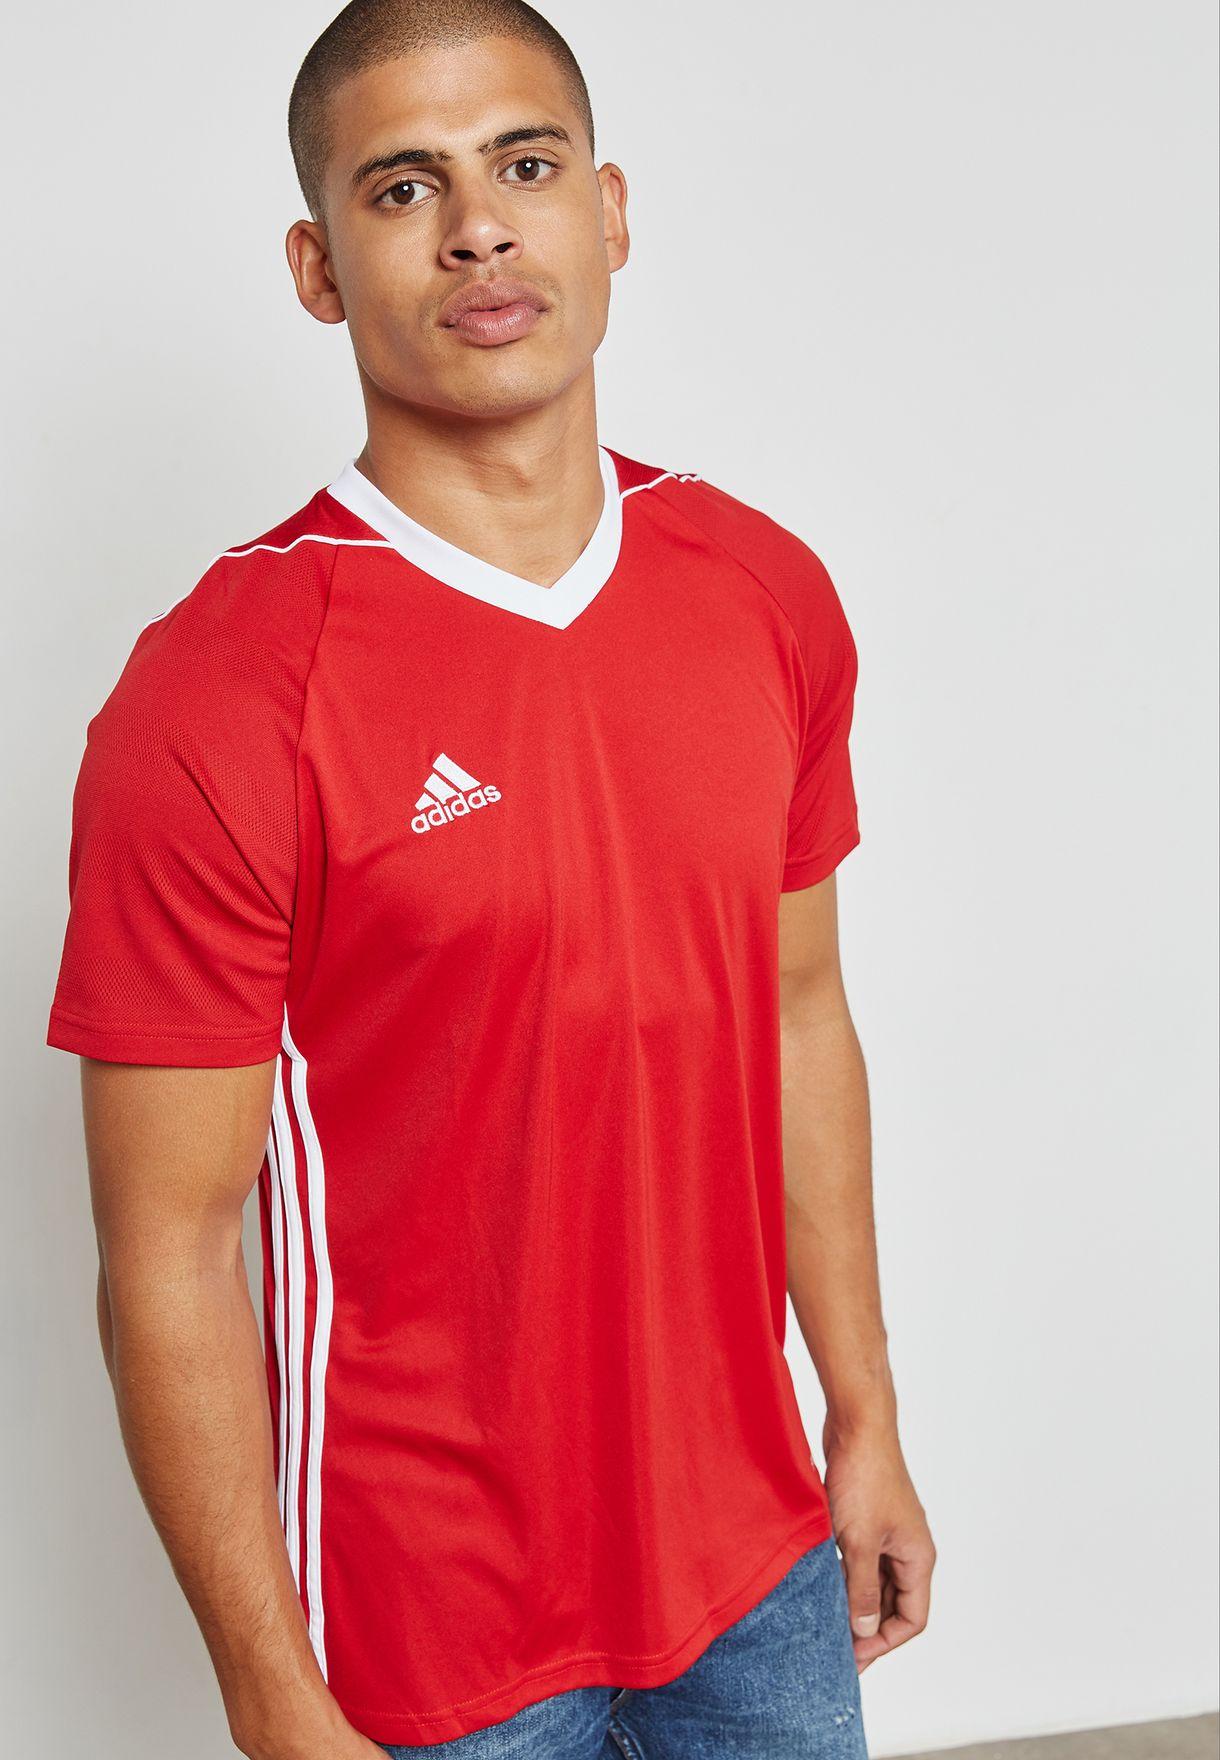 Economía Mirar fijamente Doctrina  Buy adidas red Tiro 17 Jersey for Men in MENA, Worldwide | S99146